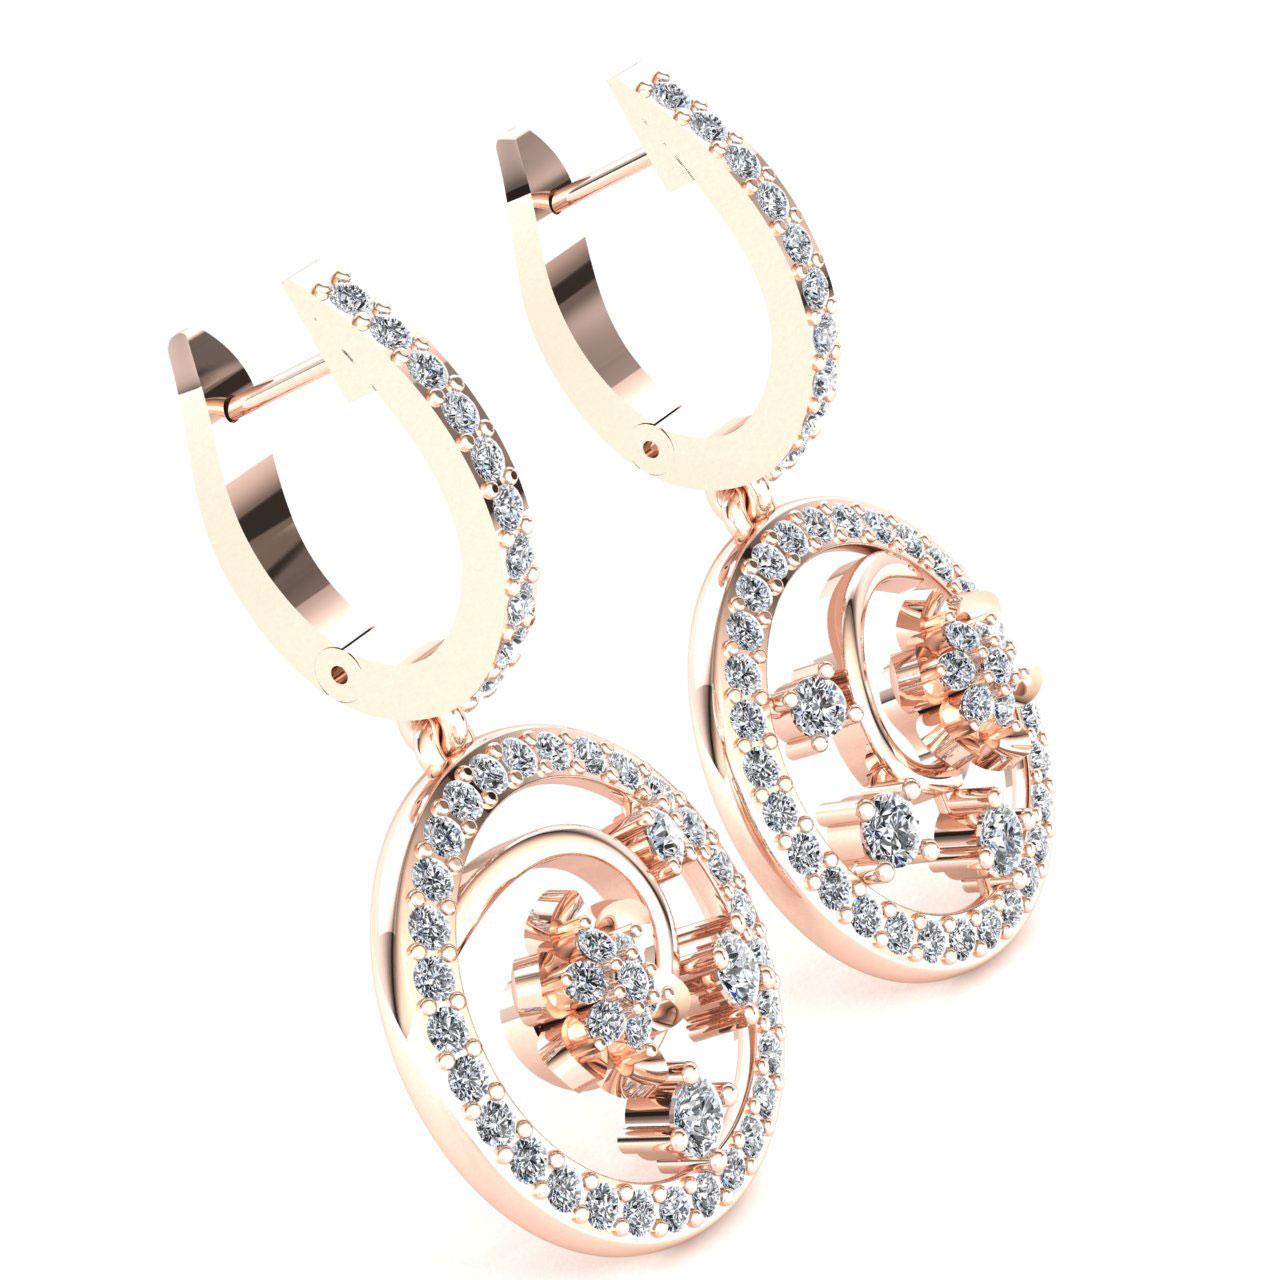 Genuine-1-15carat-Round-Cut-Diamond-Ladies-Flower-Circles-Earrings-14K-Gold thumbnail 8